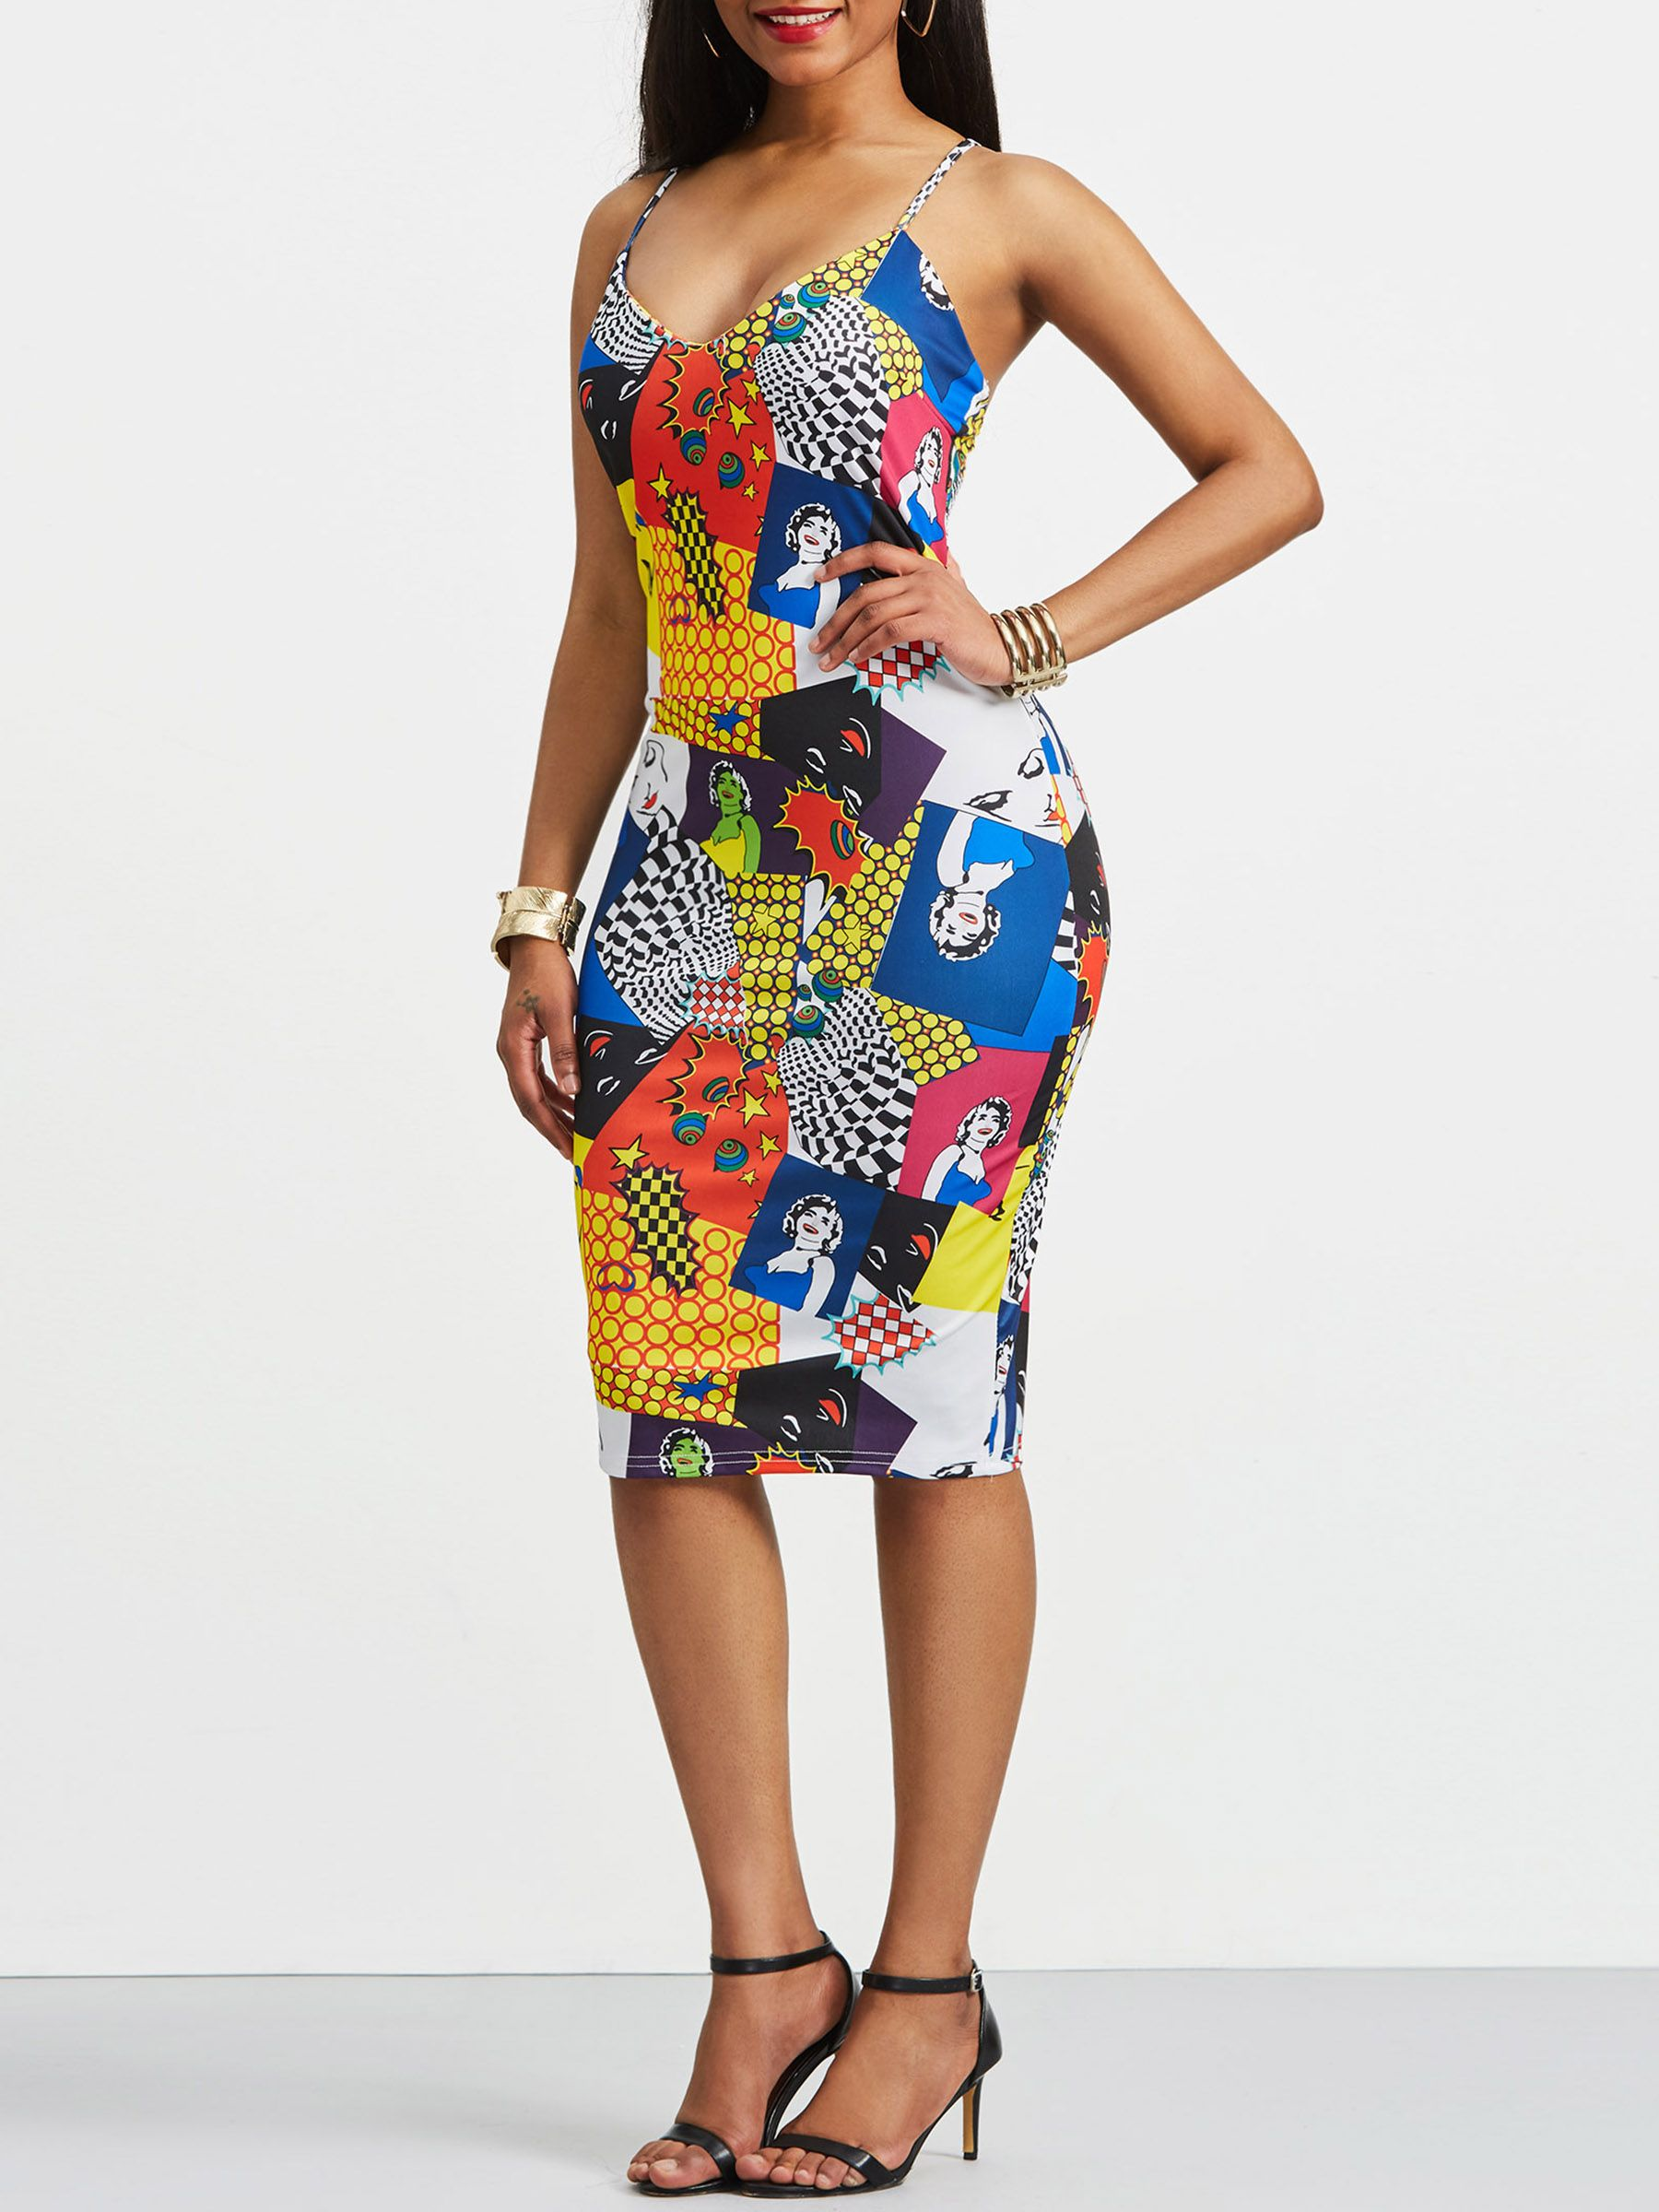 Ericdress Spaghetti Strap Print Pullover Bodycon Dress Backless Bodycon Dresses Dresses African Fashion Dresses [ 2400 x 1800 Pixel ]